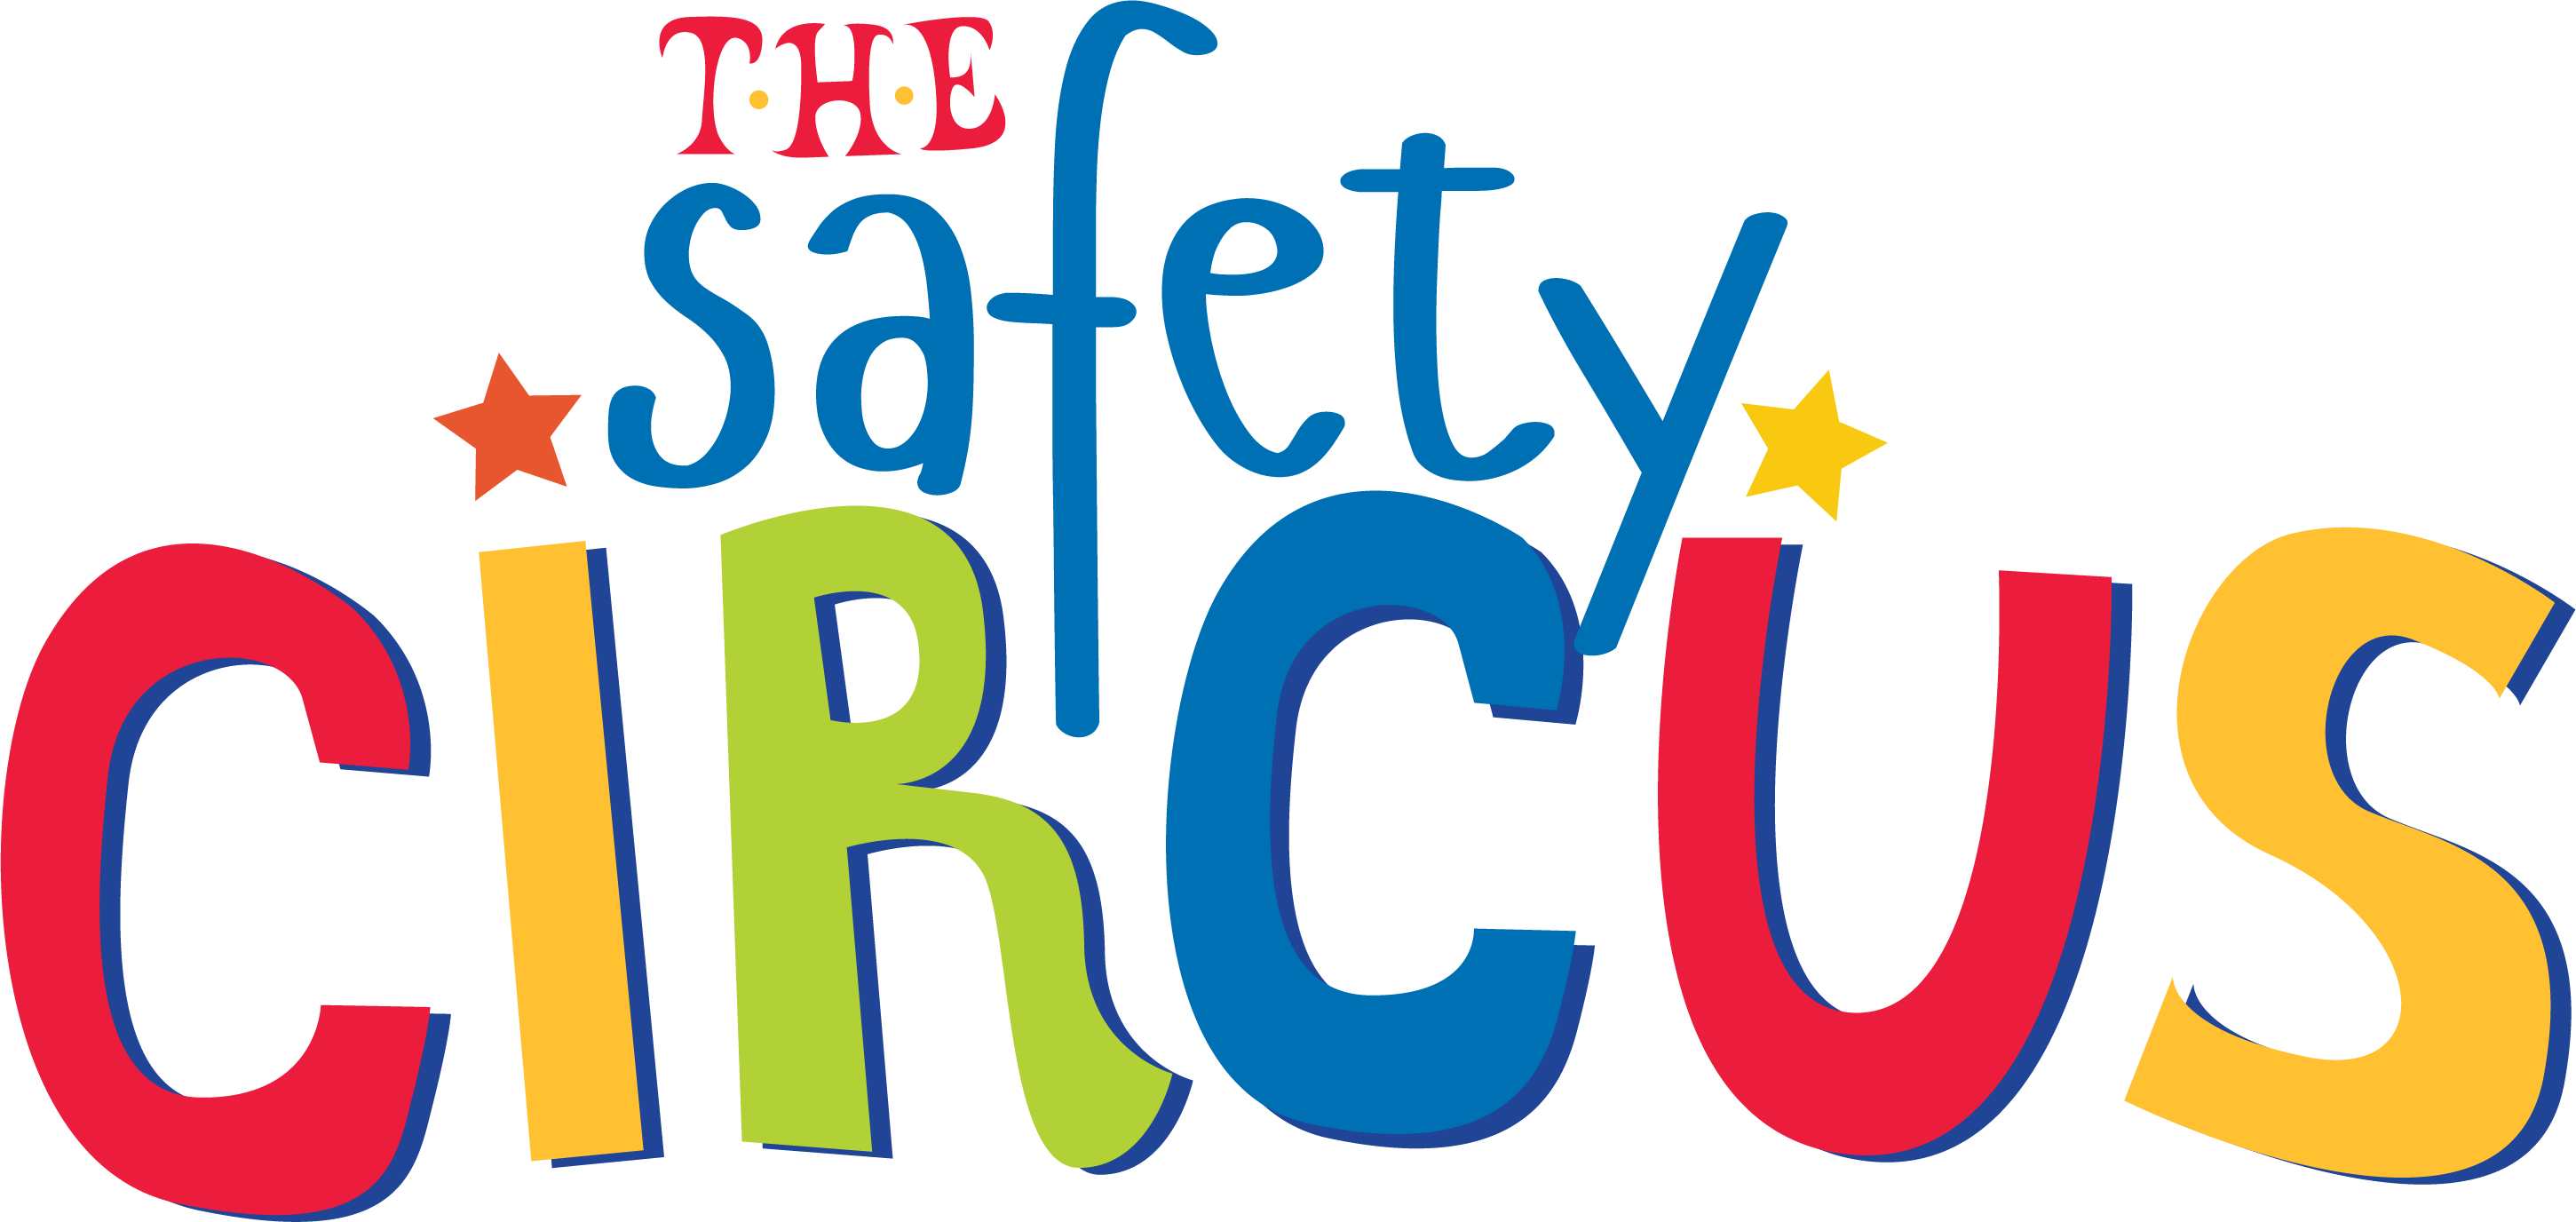 safety circus